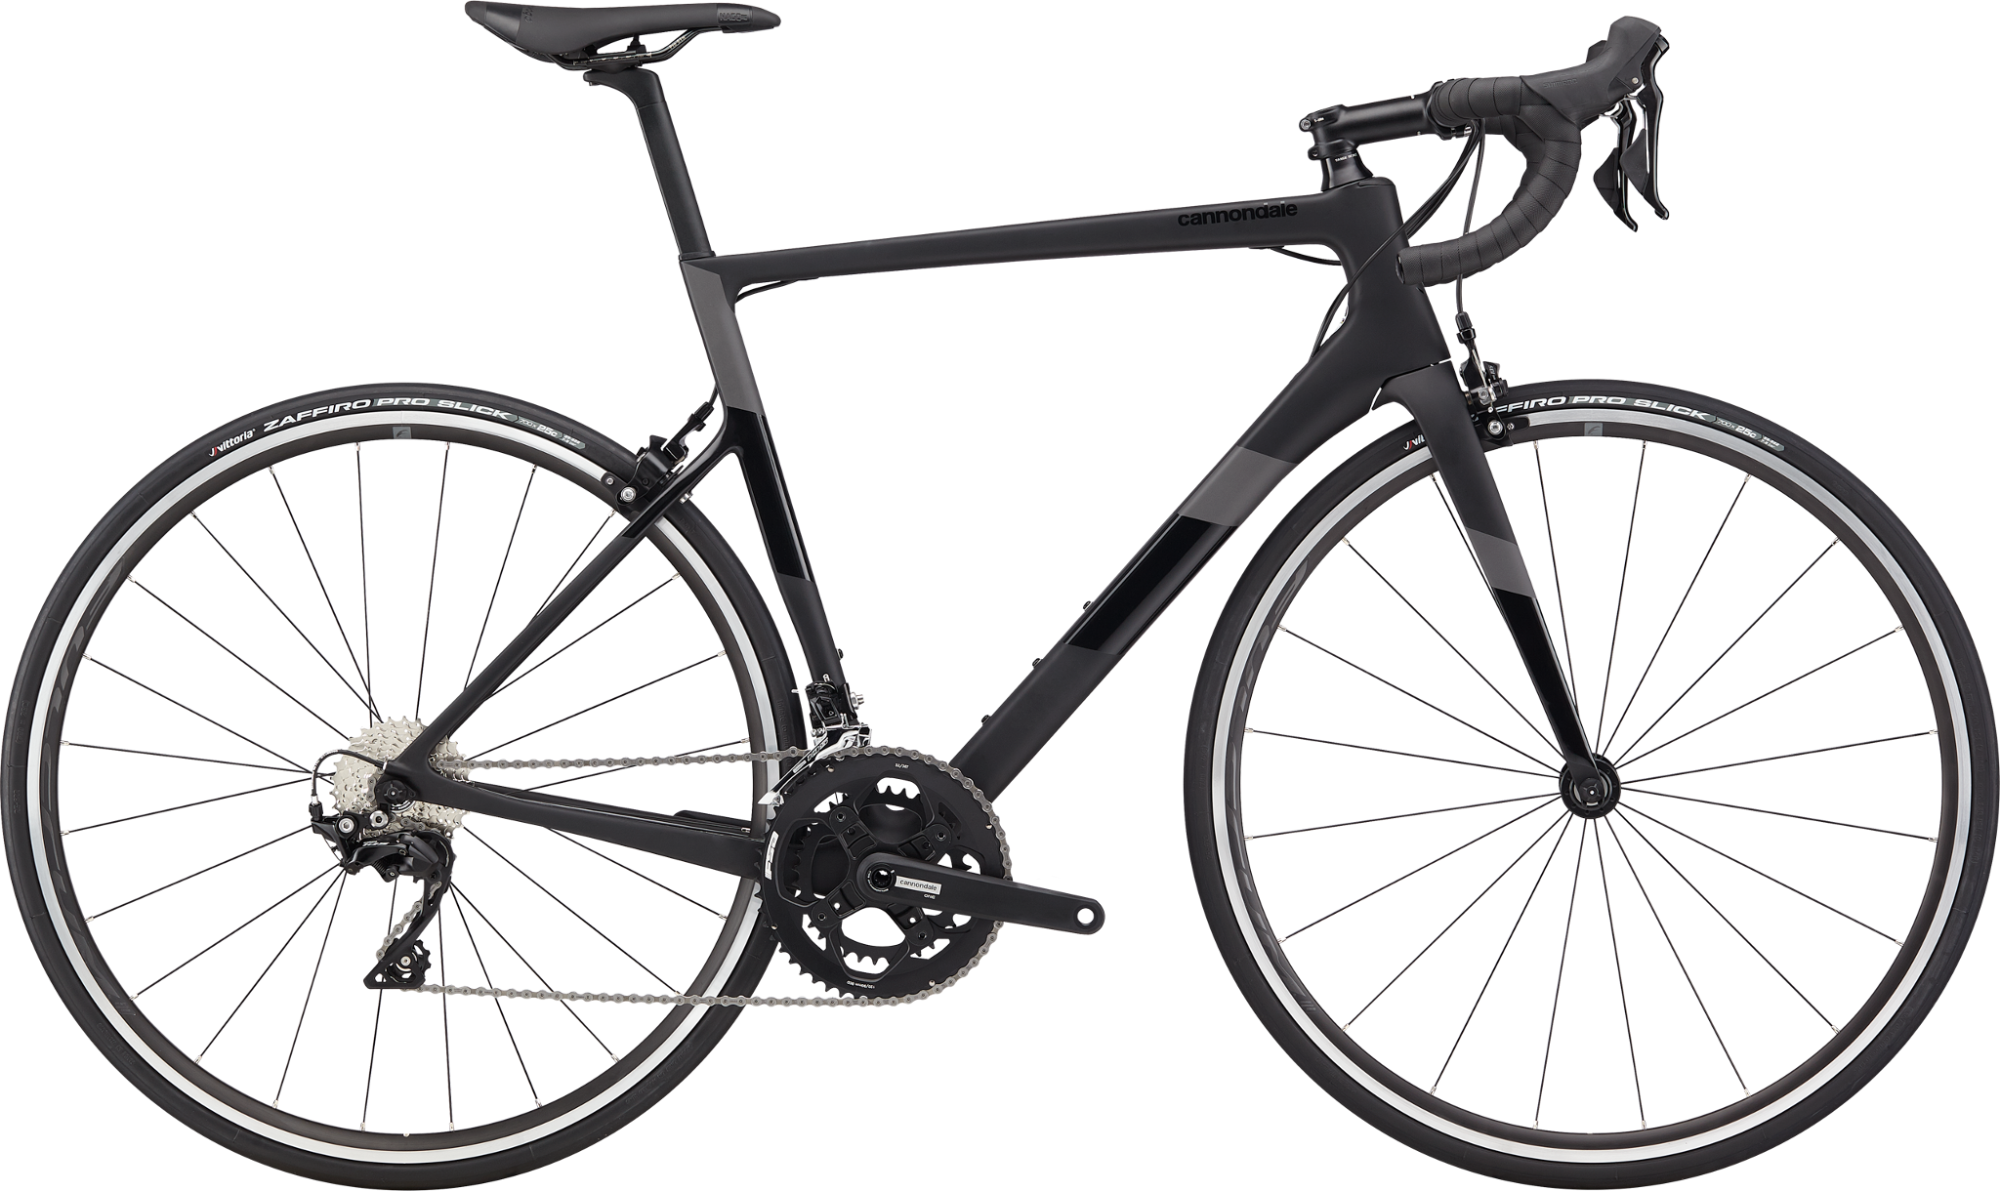 Bicicleta Cannondale Supersix Evo Carbon 105